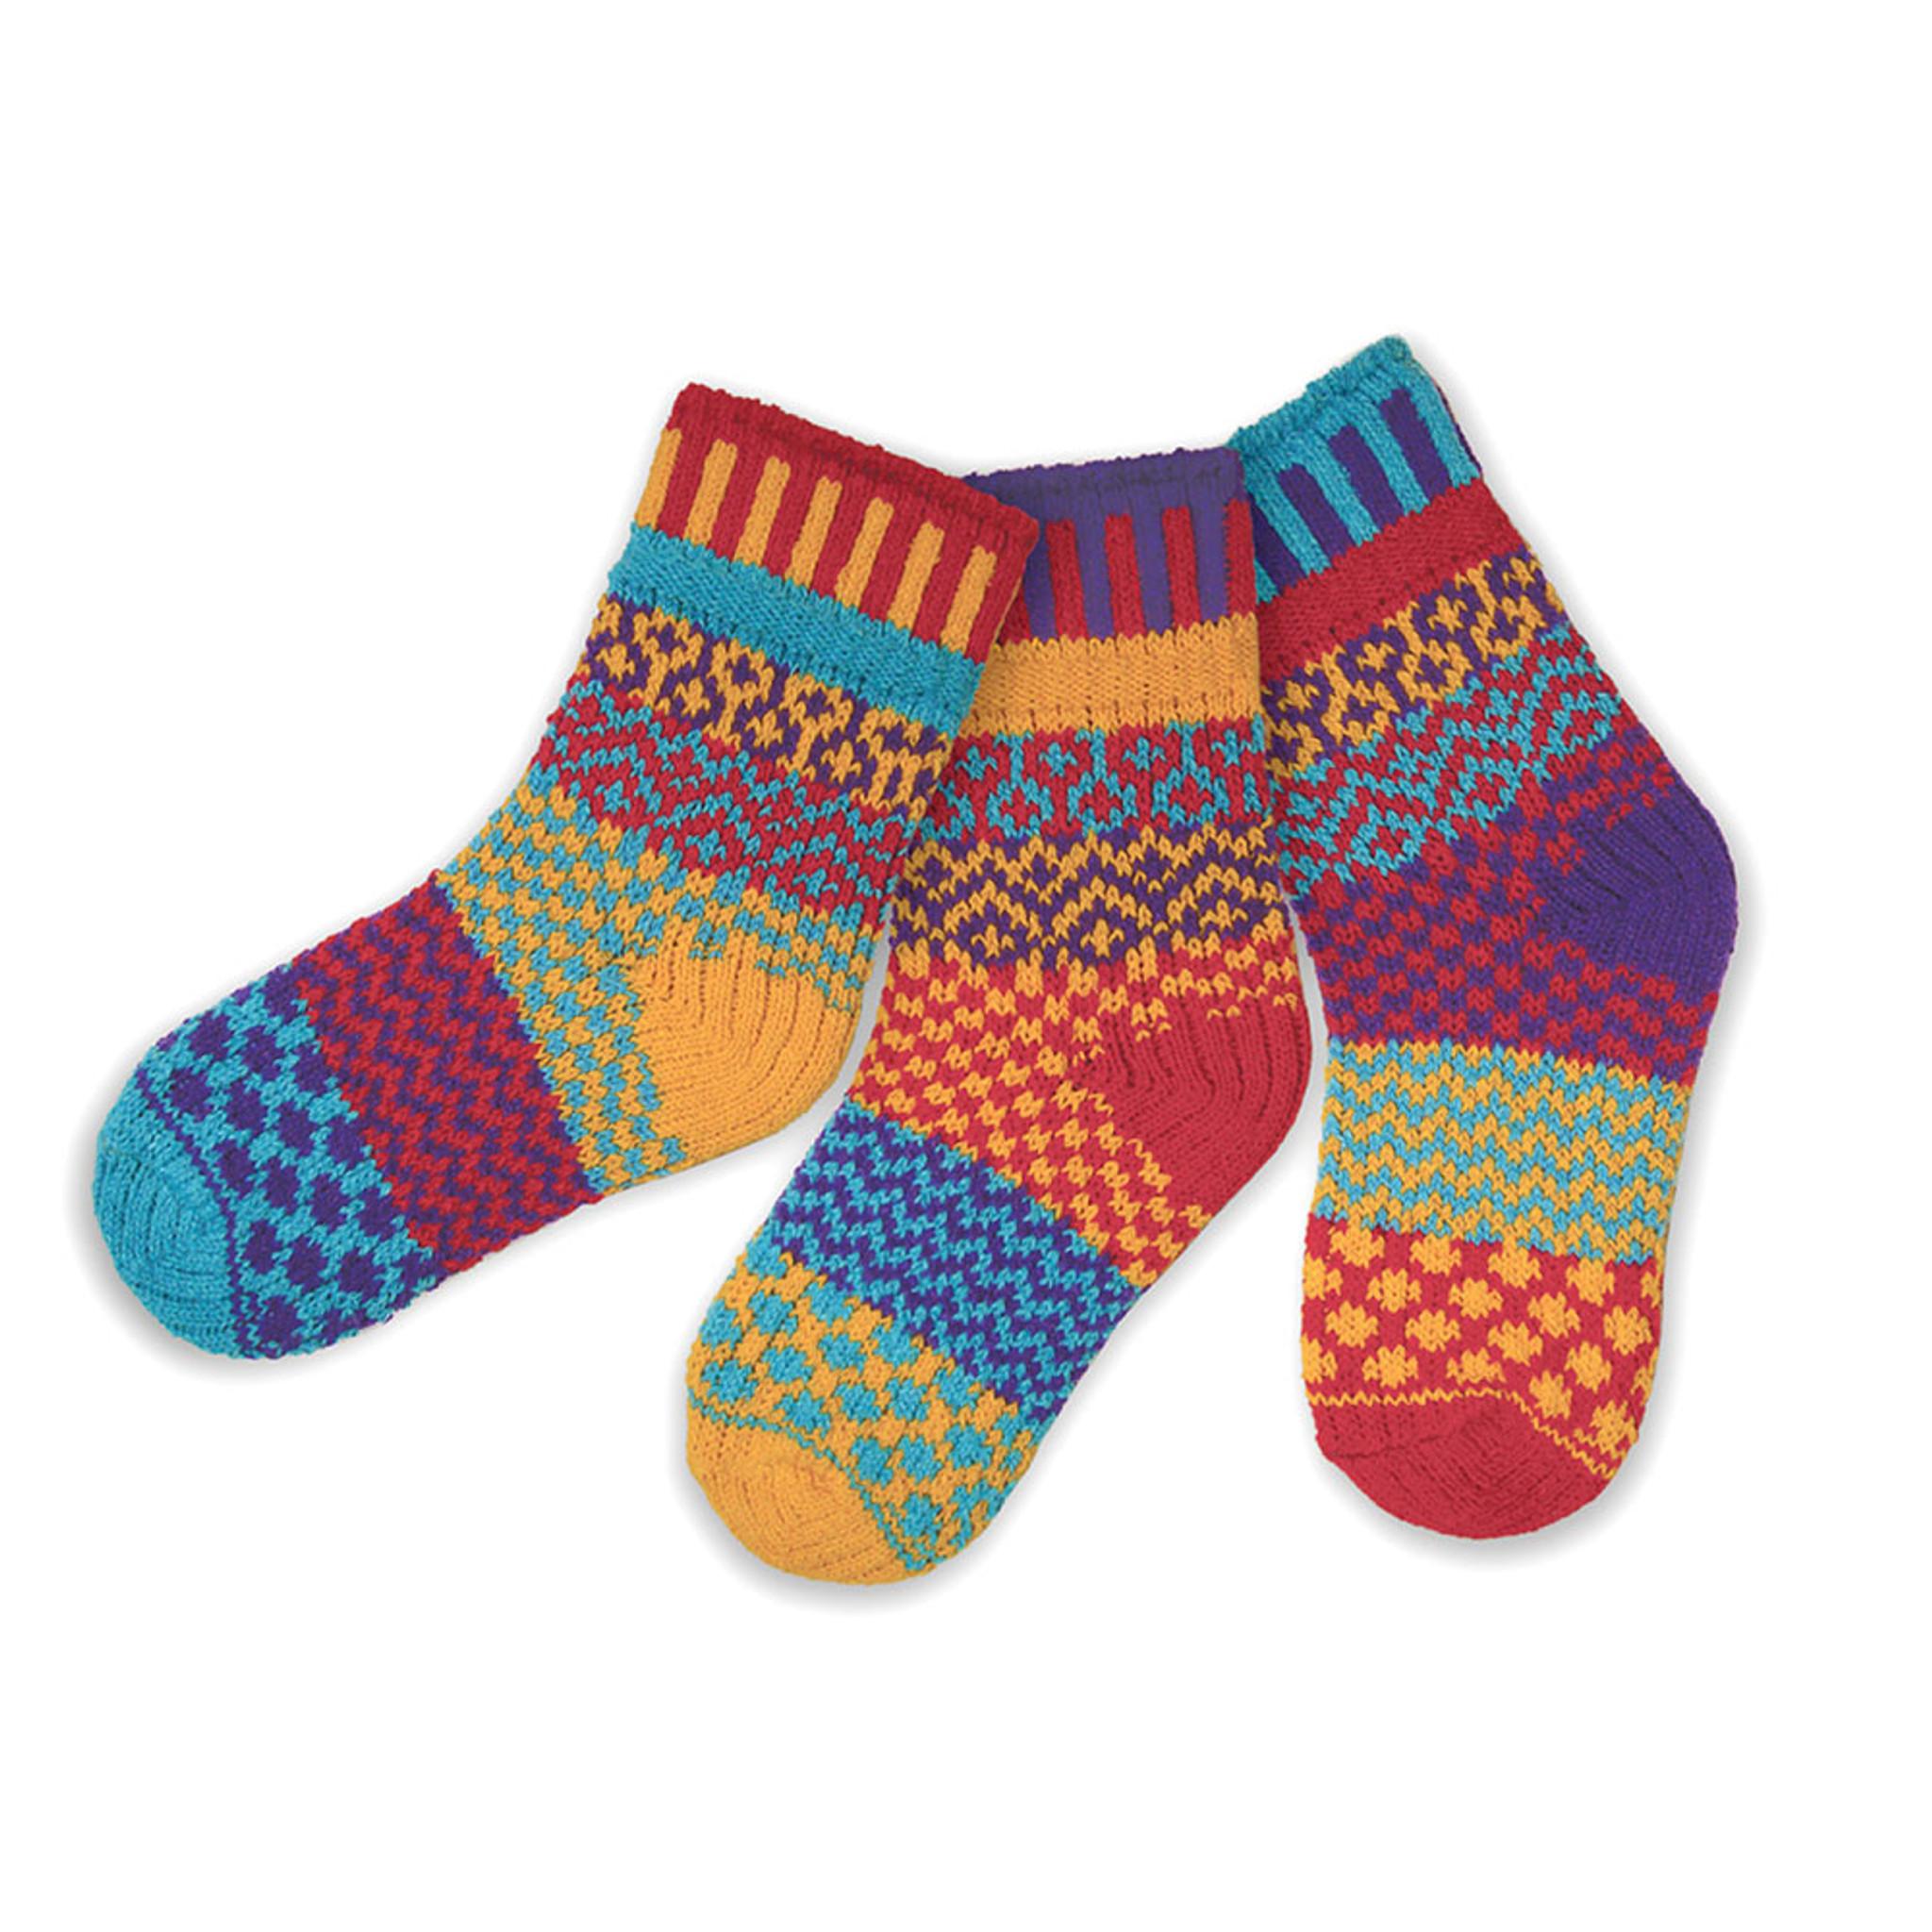 Firefly Kids Socks - a pair with a spare   Eartheasy.com